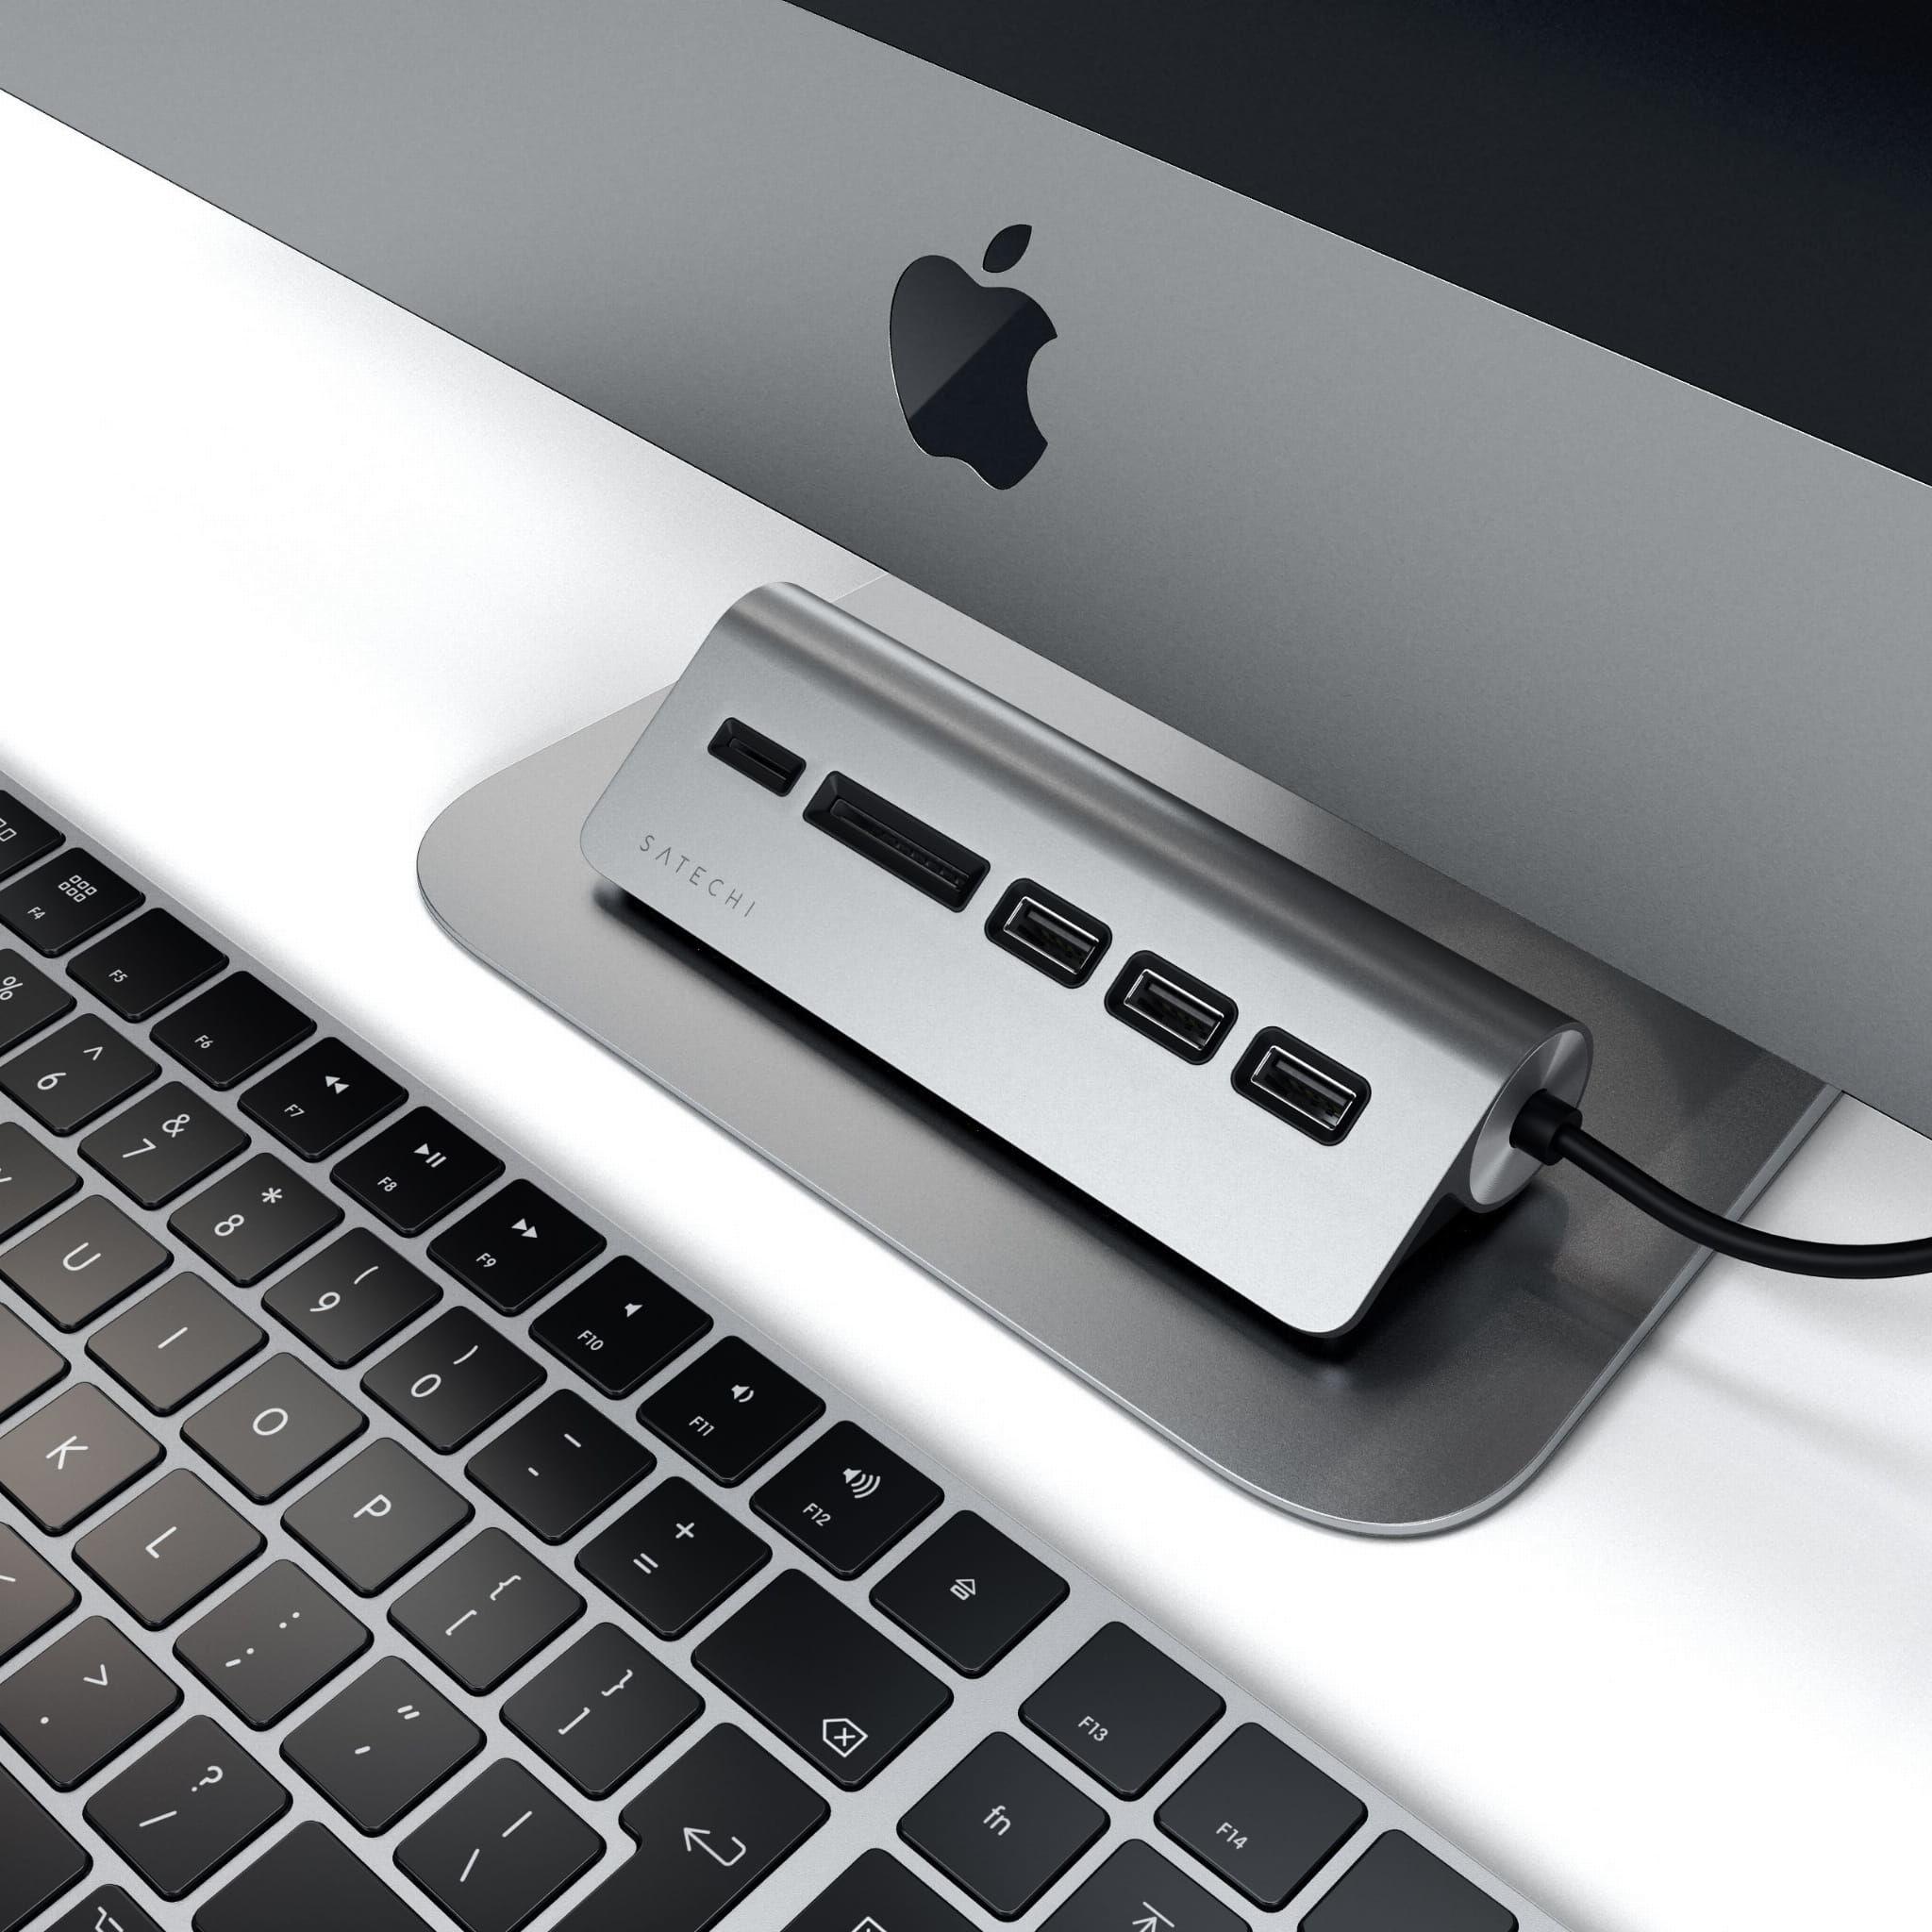 SATECHI USB-C ALUMINUM USB 3.0 HUB & CARD READER Space Gray iMac